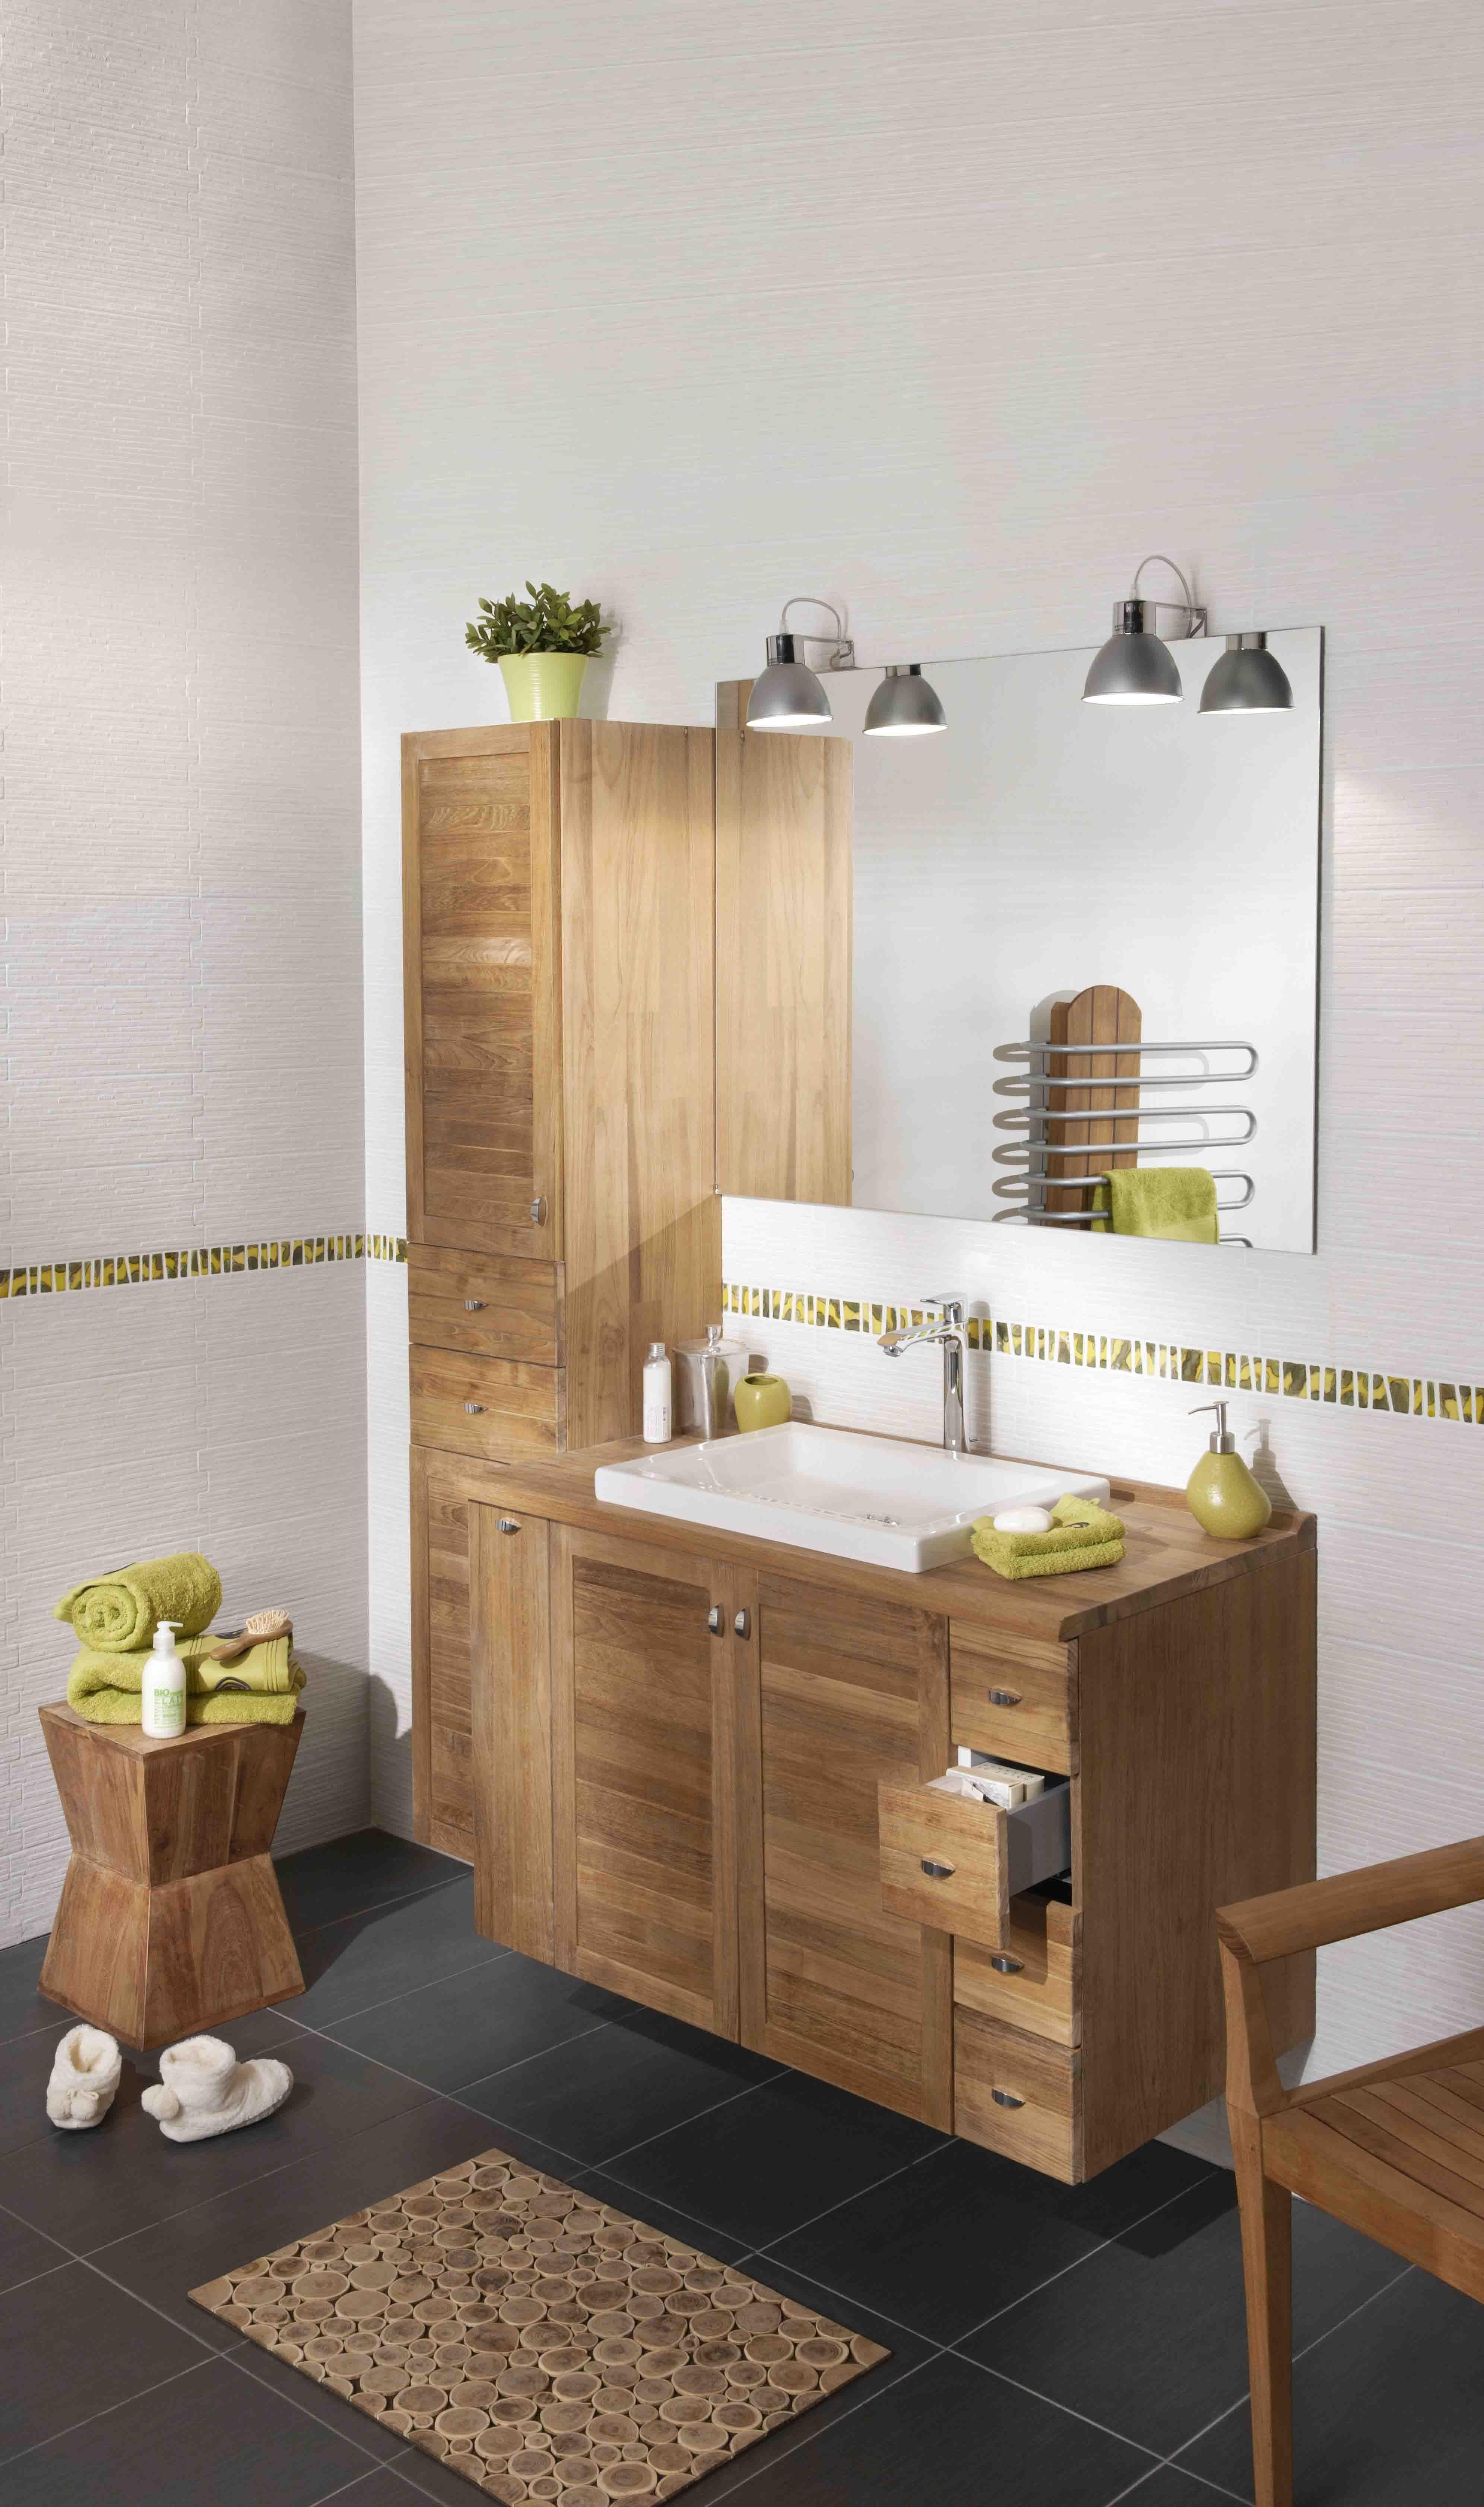 meuble bois modele creatis teck http www lapeyre fr